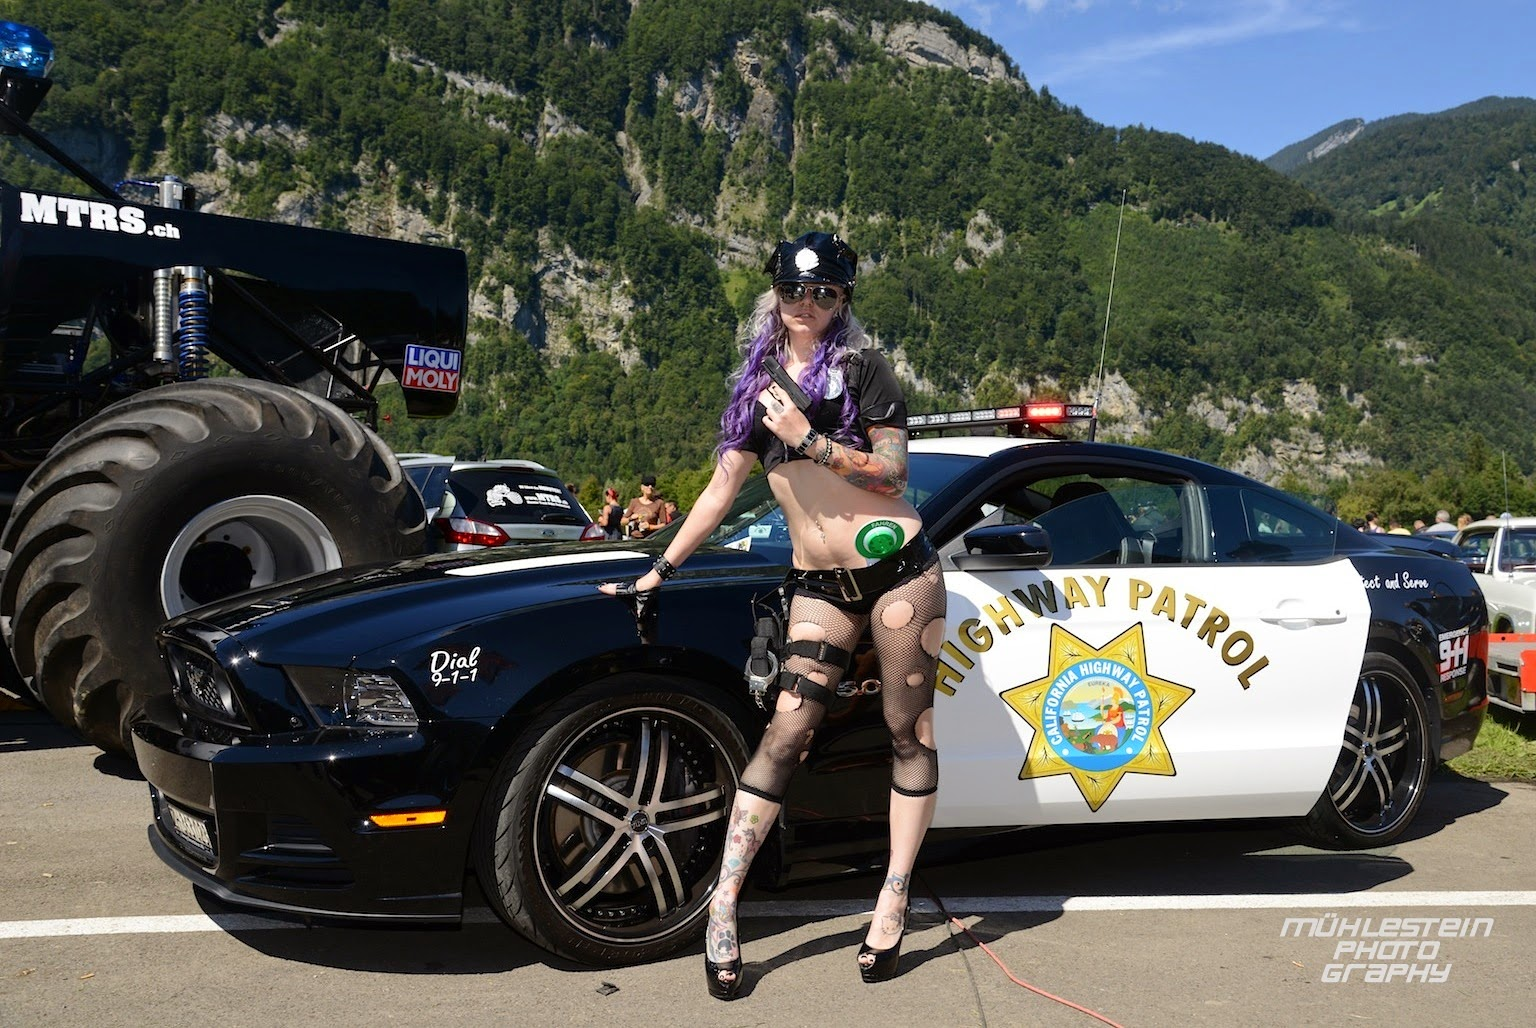 burn out mollis 2014 us car amp bike festival california highway patrol police girls with officer